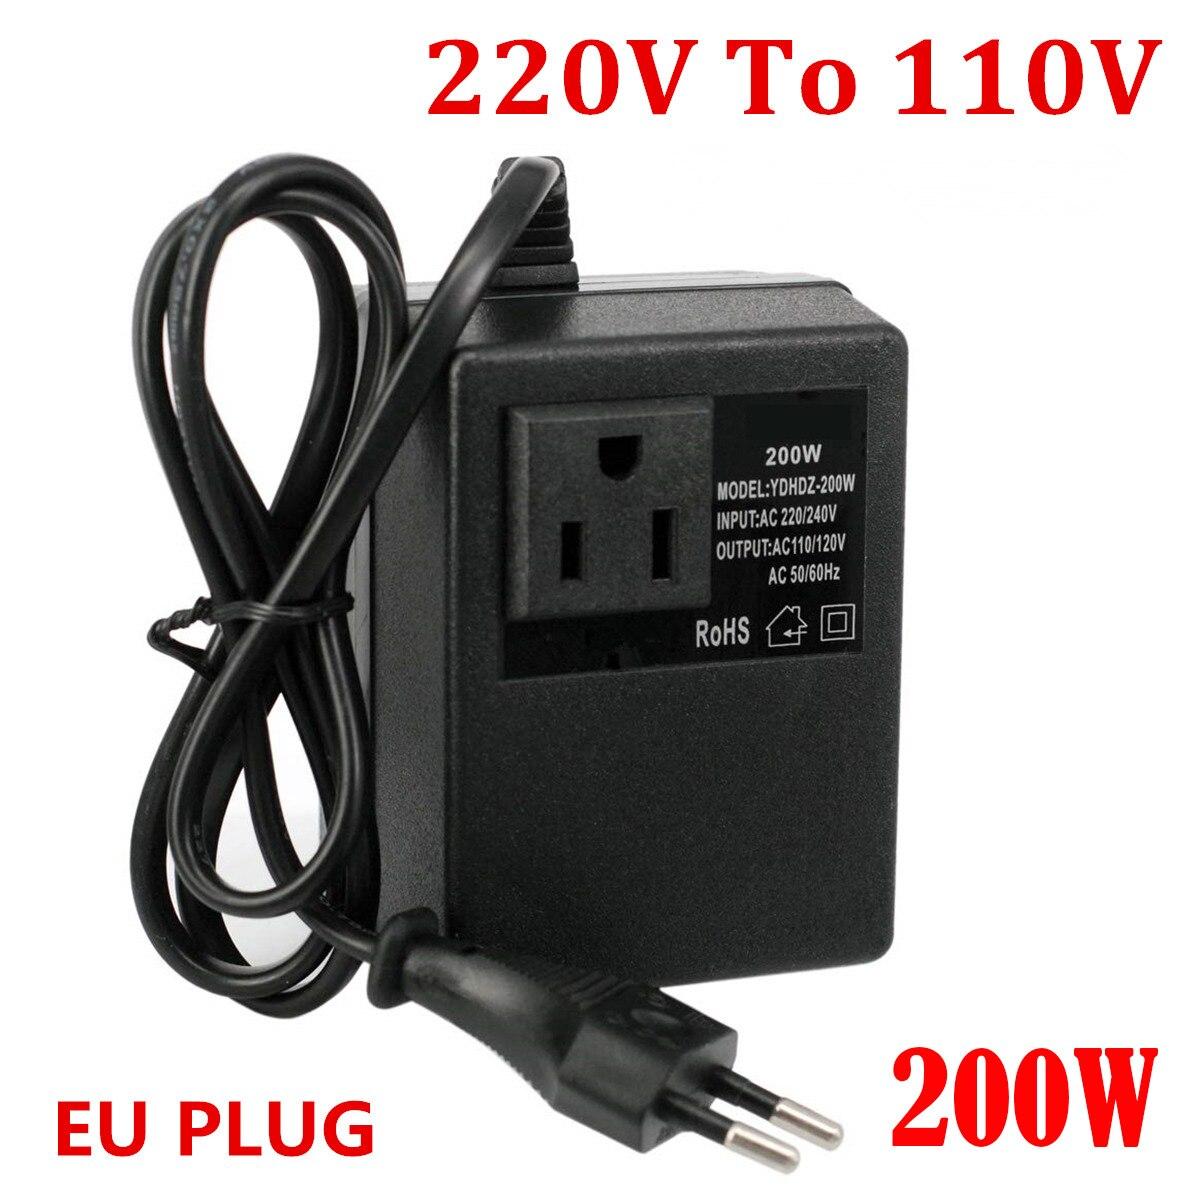 200W Voltage Converter Transformer 220V To 110V Step Down Travel EU Plug Voltage Transformer Converter